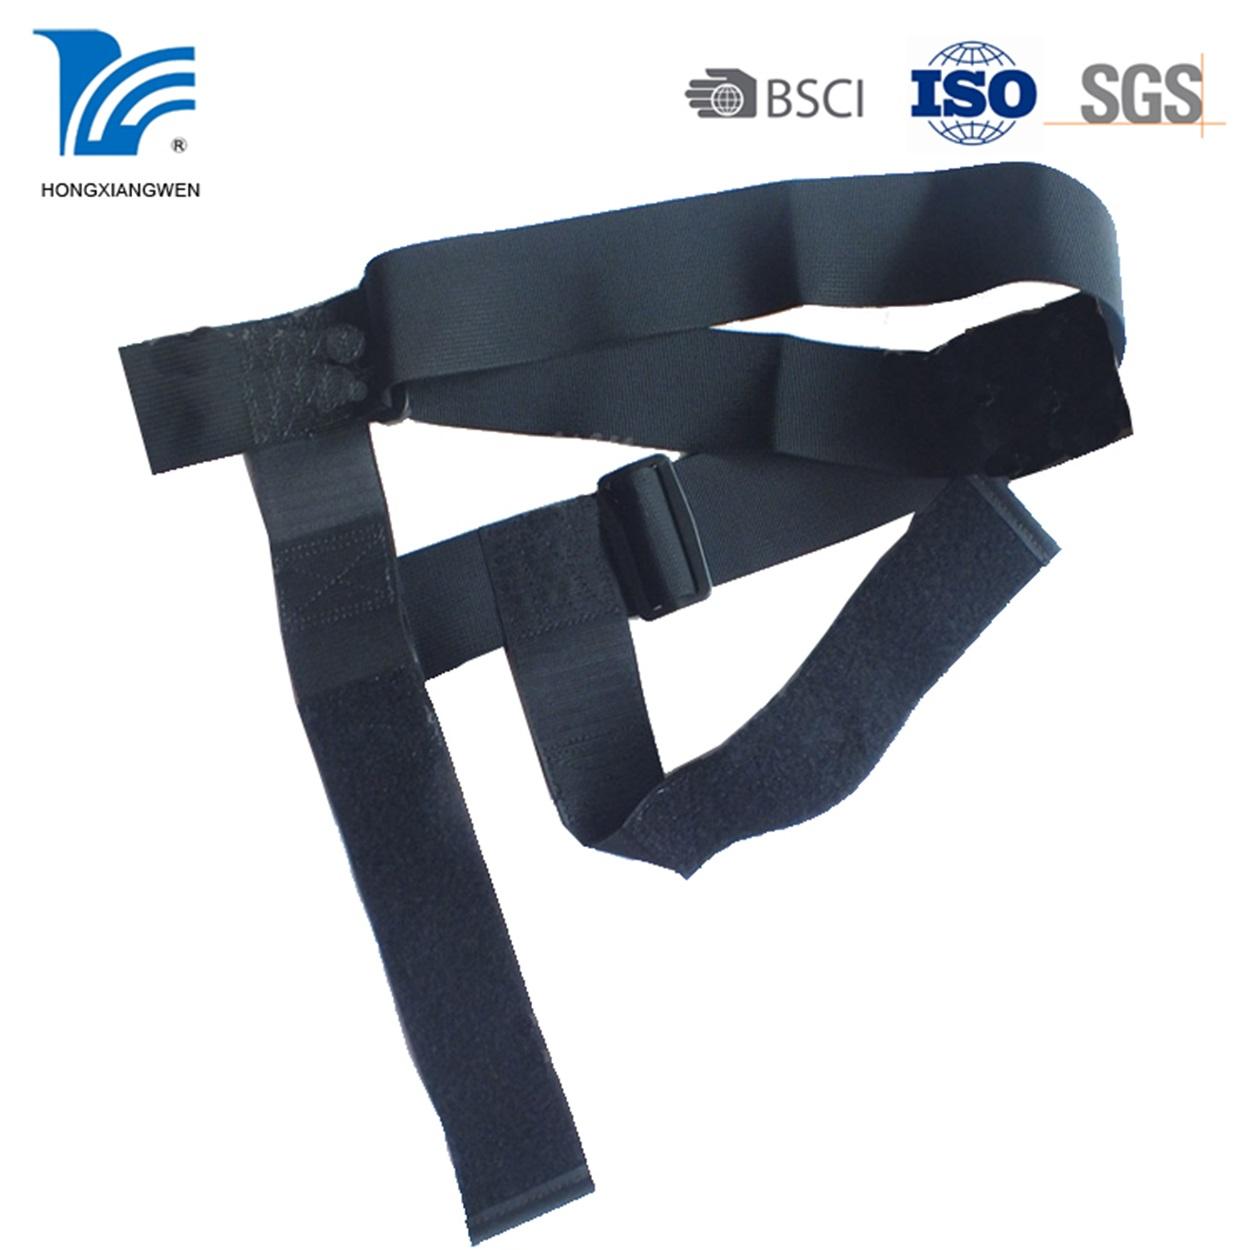 Snowboard Shoulder Strap for Ski for Snowboarding Yencoly Adjustable Ski Strap